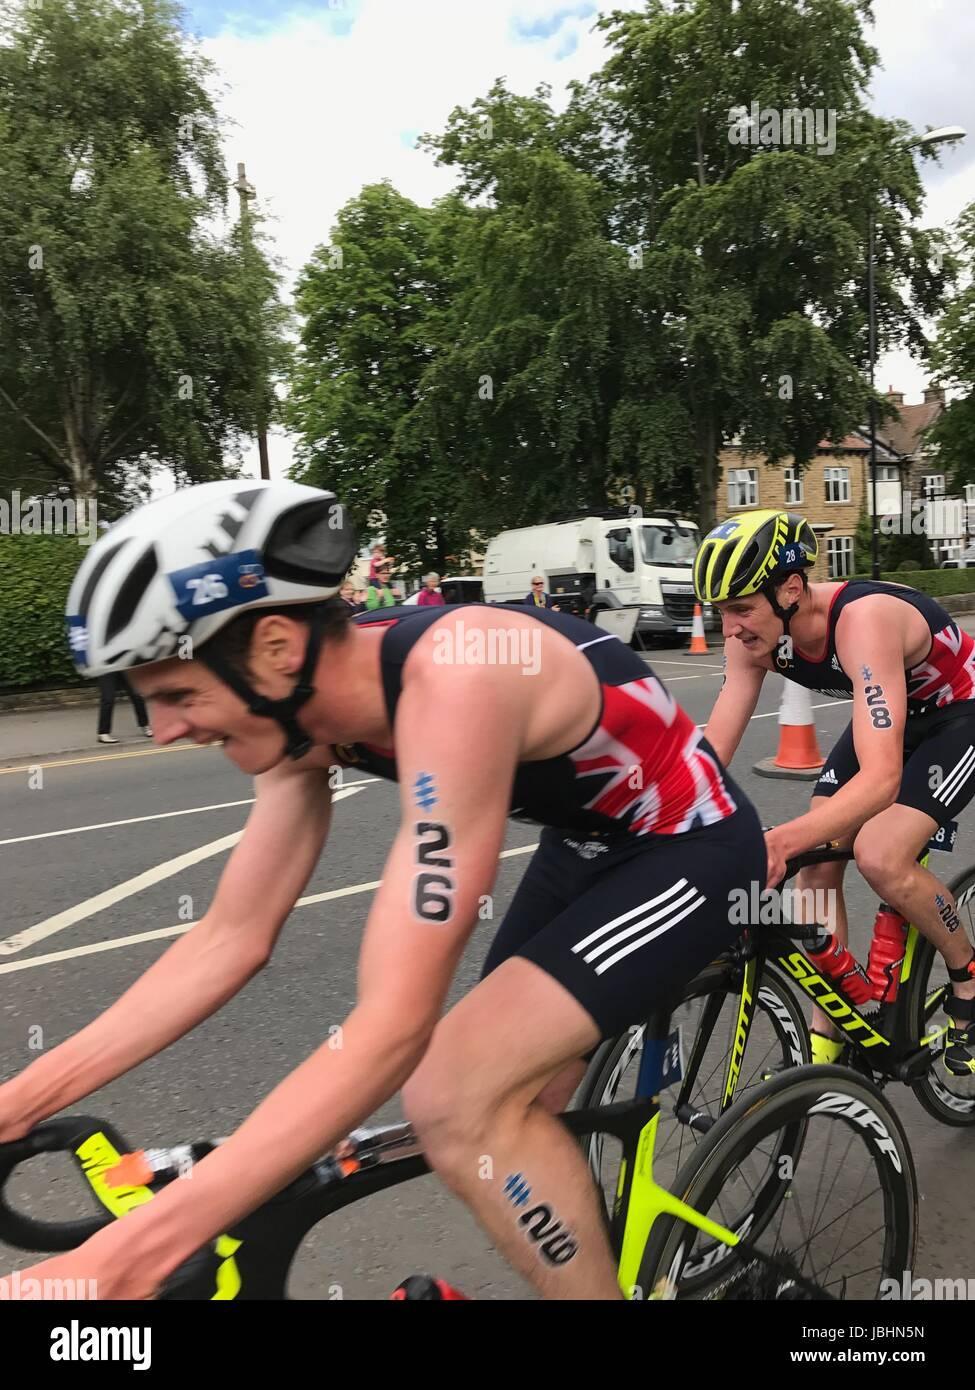 Mondo IPC Triathlon Leeds Ciclismo Alastair e Jonny Brownlee Brownlee fratelli leader del settore Immagini Stock